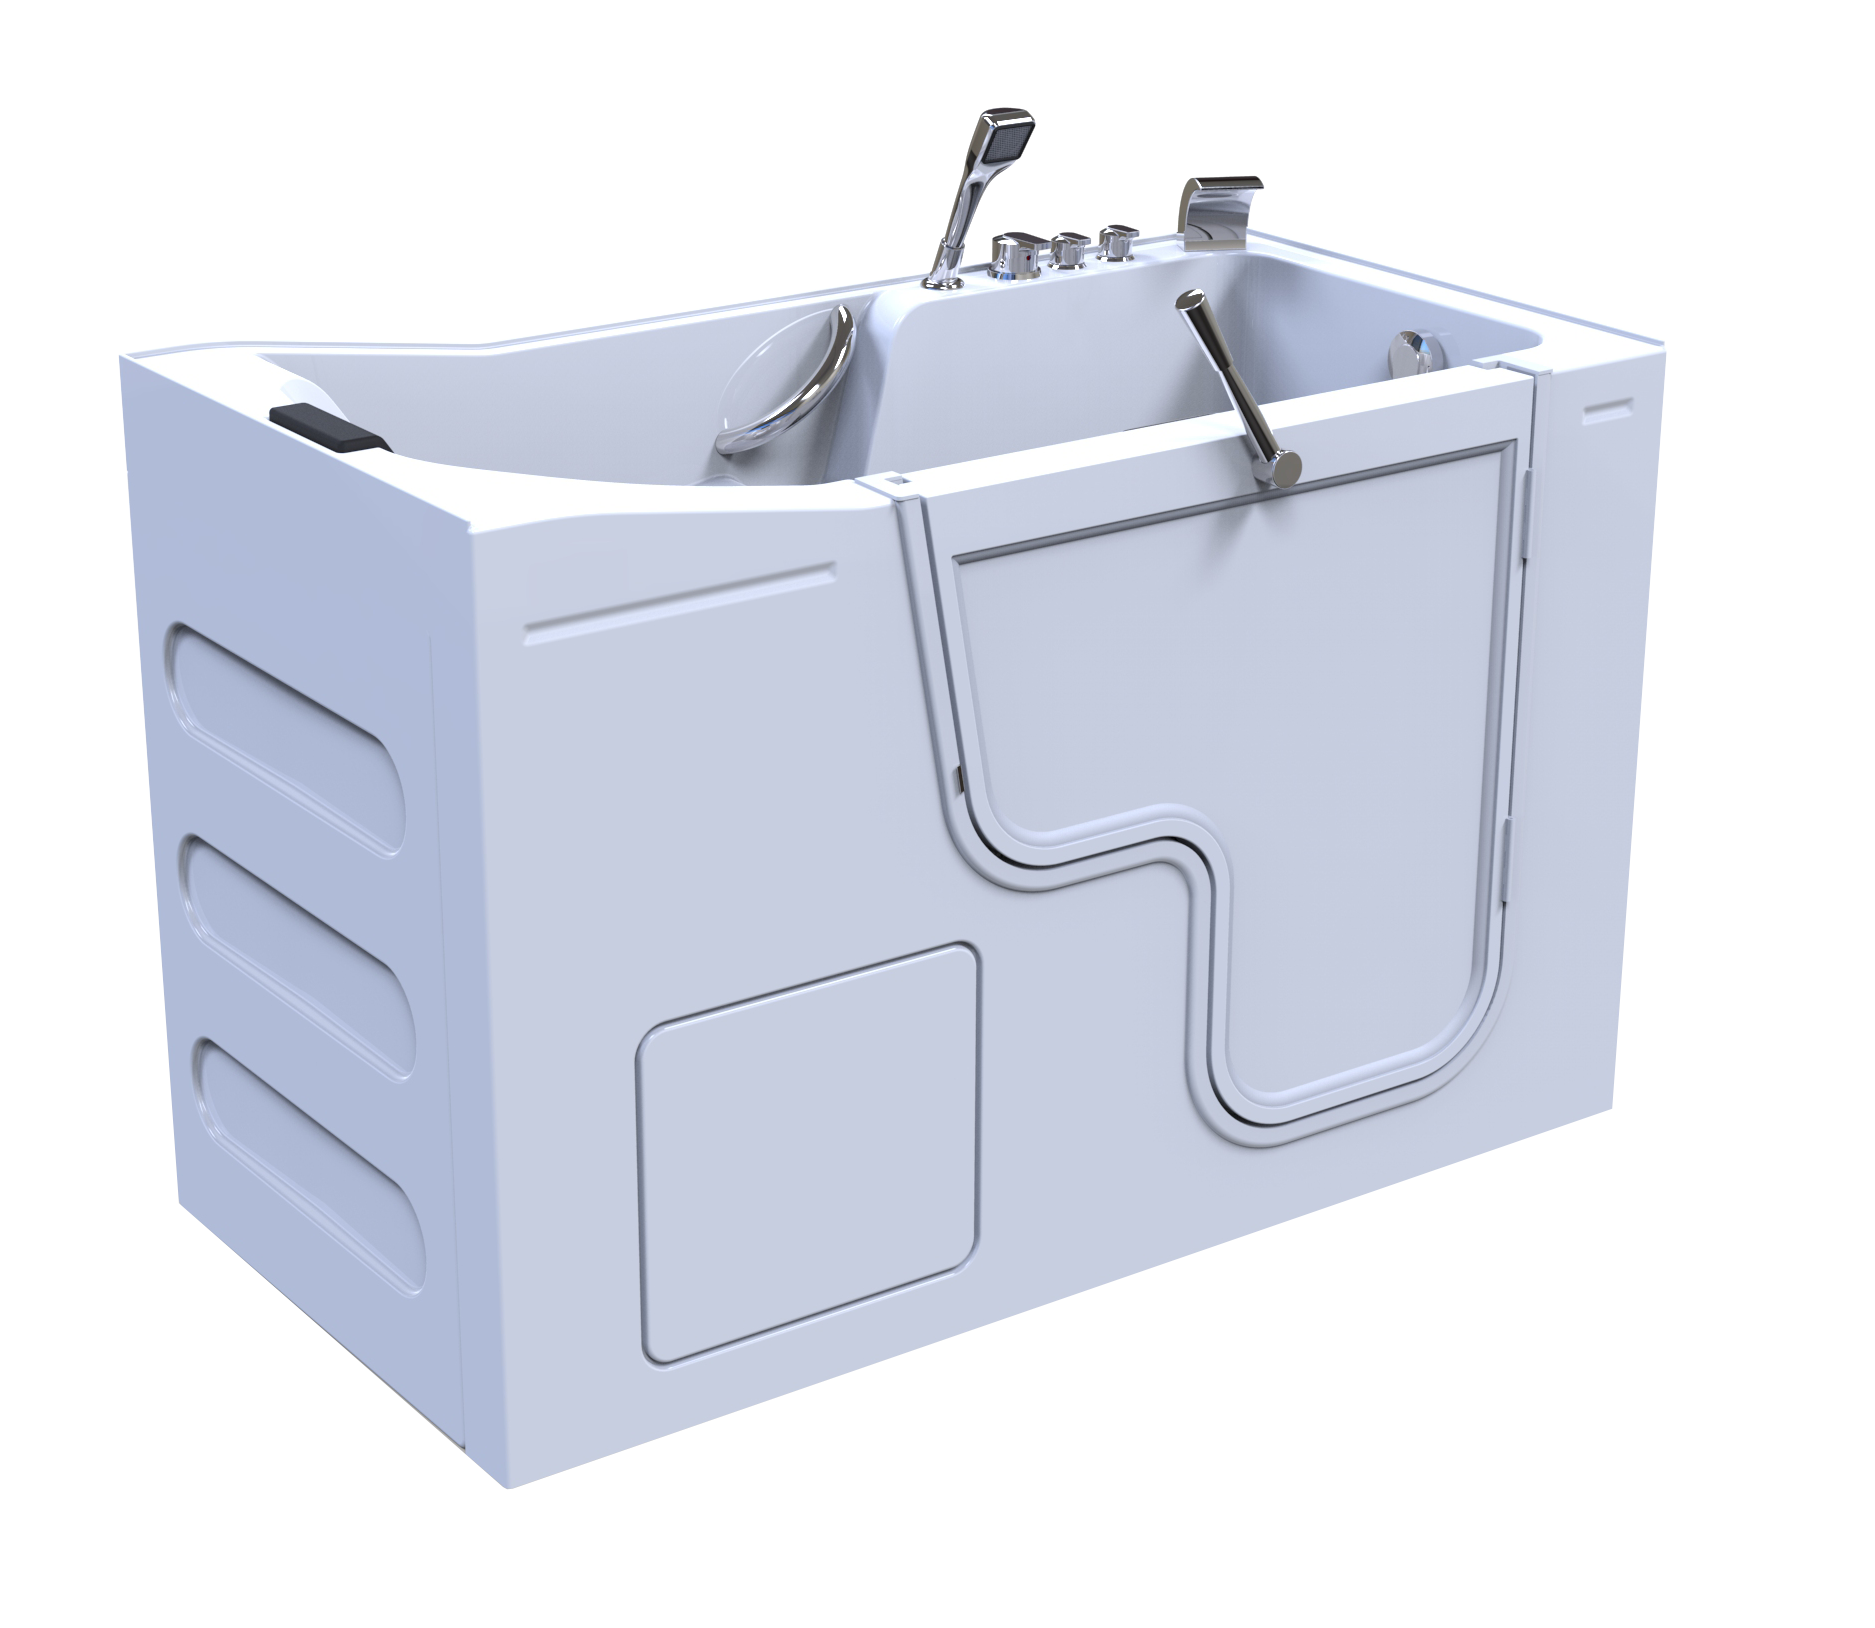 3d model of Oasis style walk-in bathtub, door closed, no water